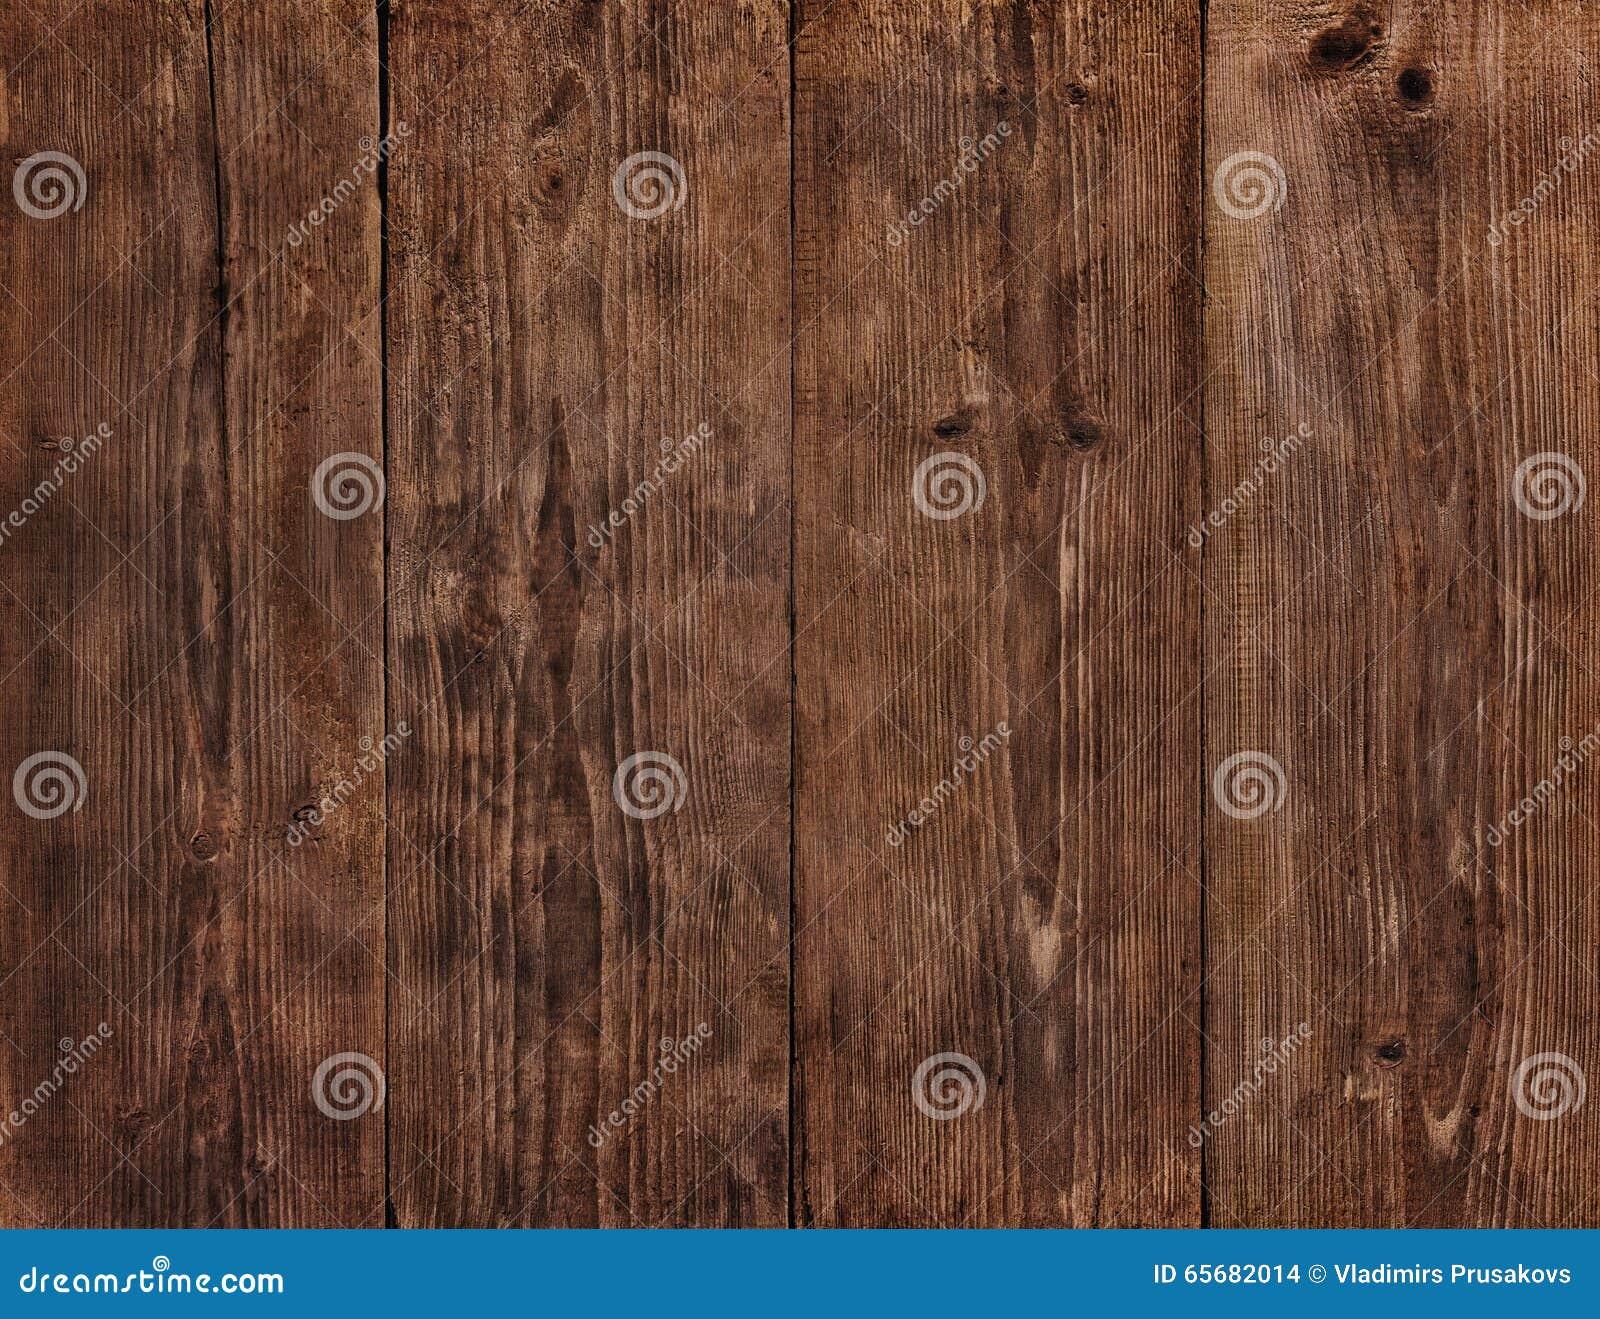 Wood Planks Texture, Wooden Background, Brown Floor Wall